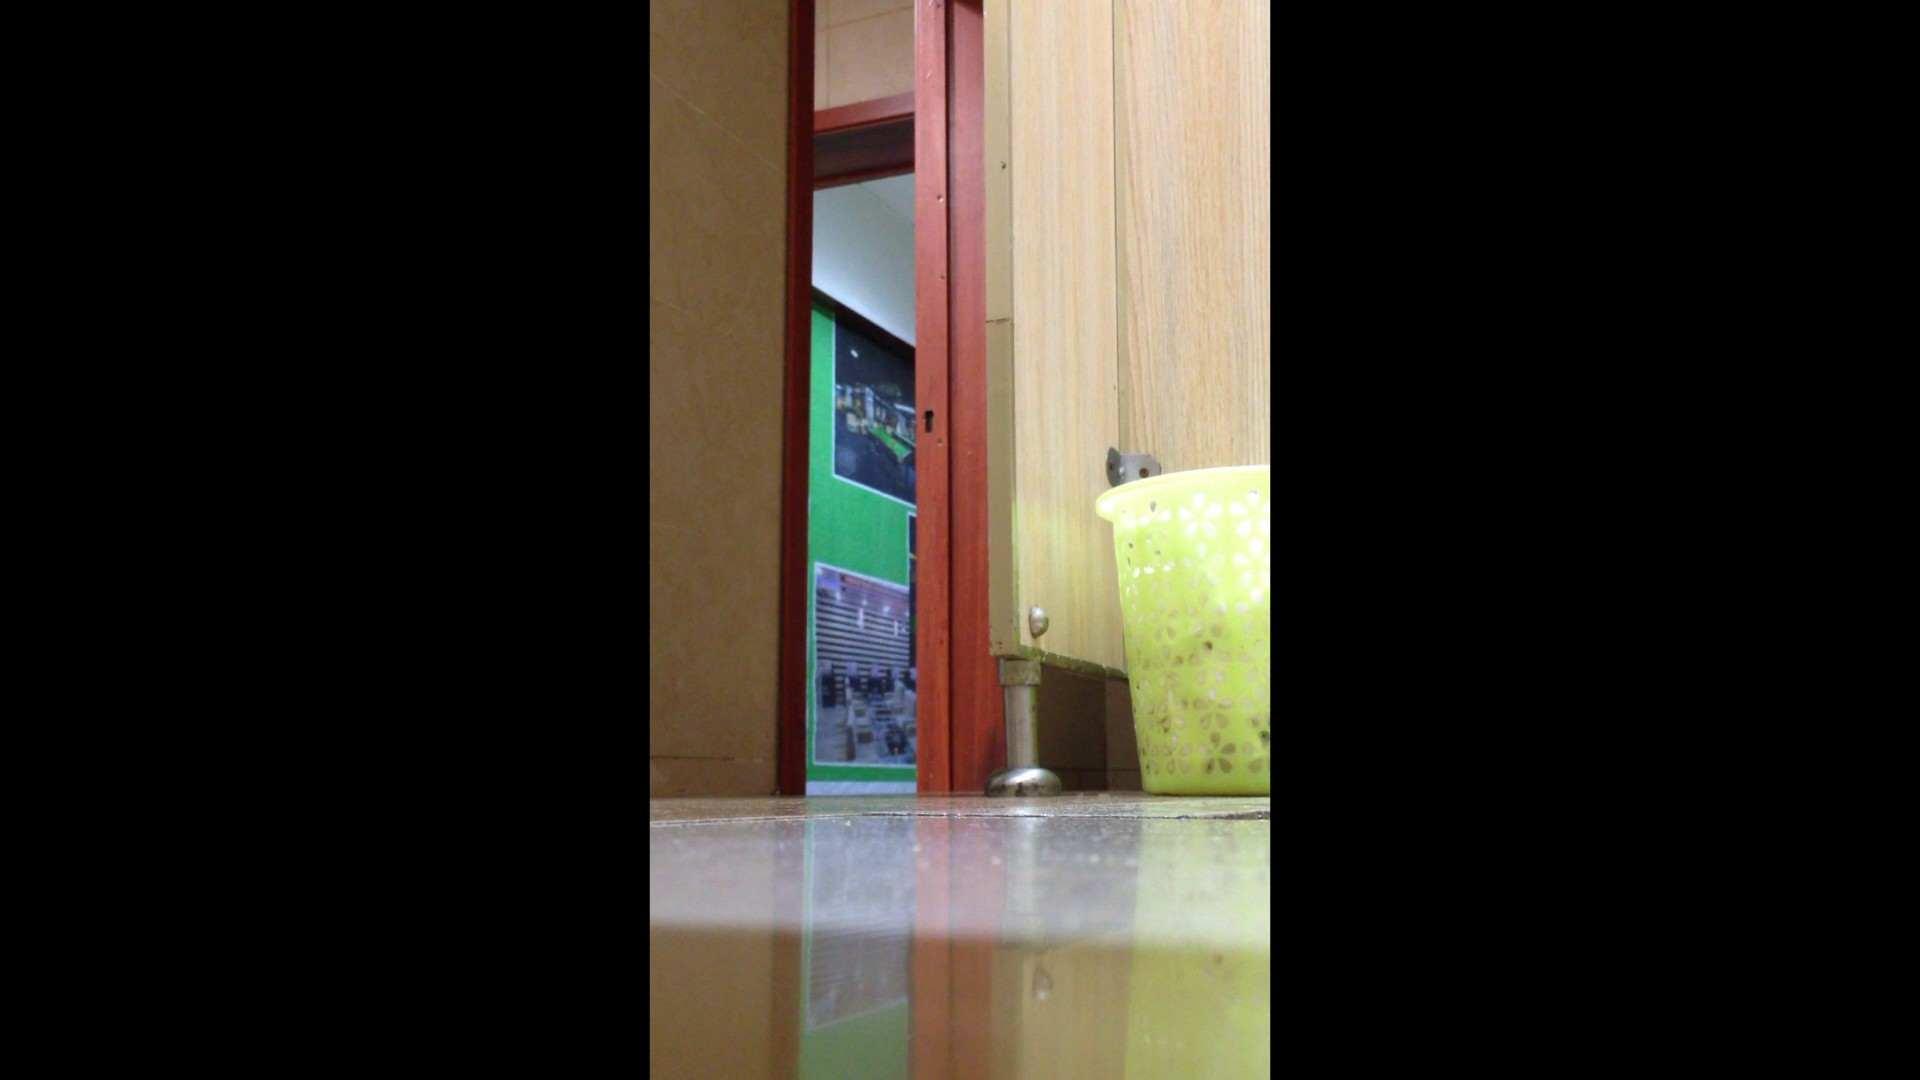 芸術大学ガチ潜入盗撮 JD盗撮 美女の洗面所の秘密 Vol.87 潜入  61pic 54